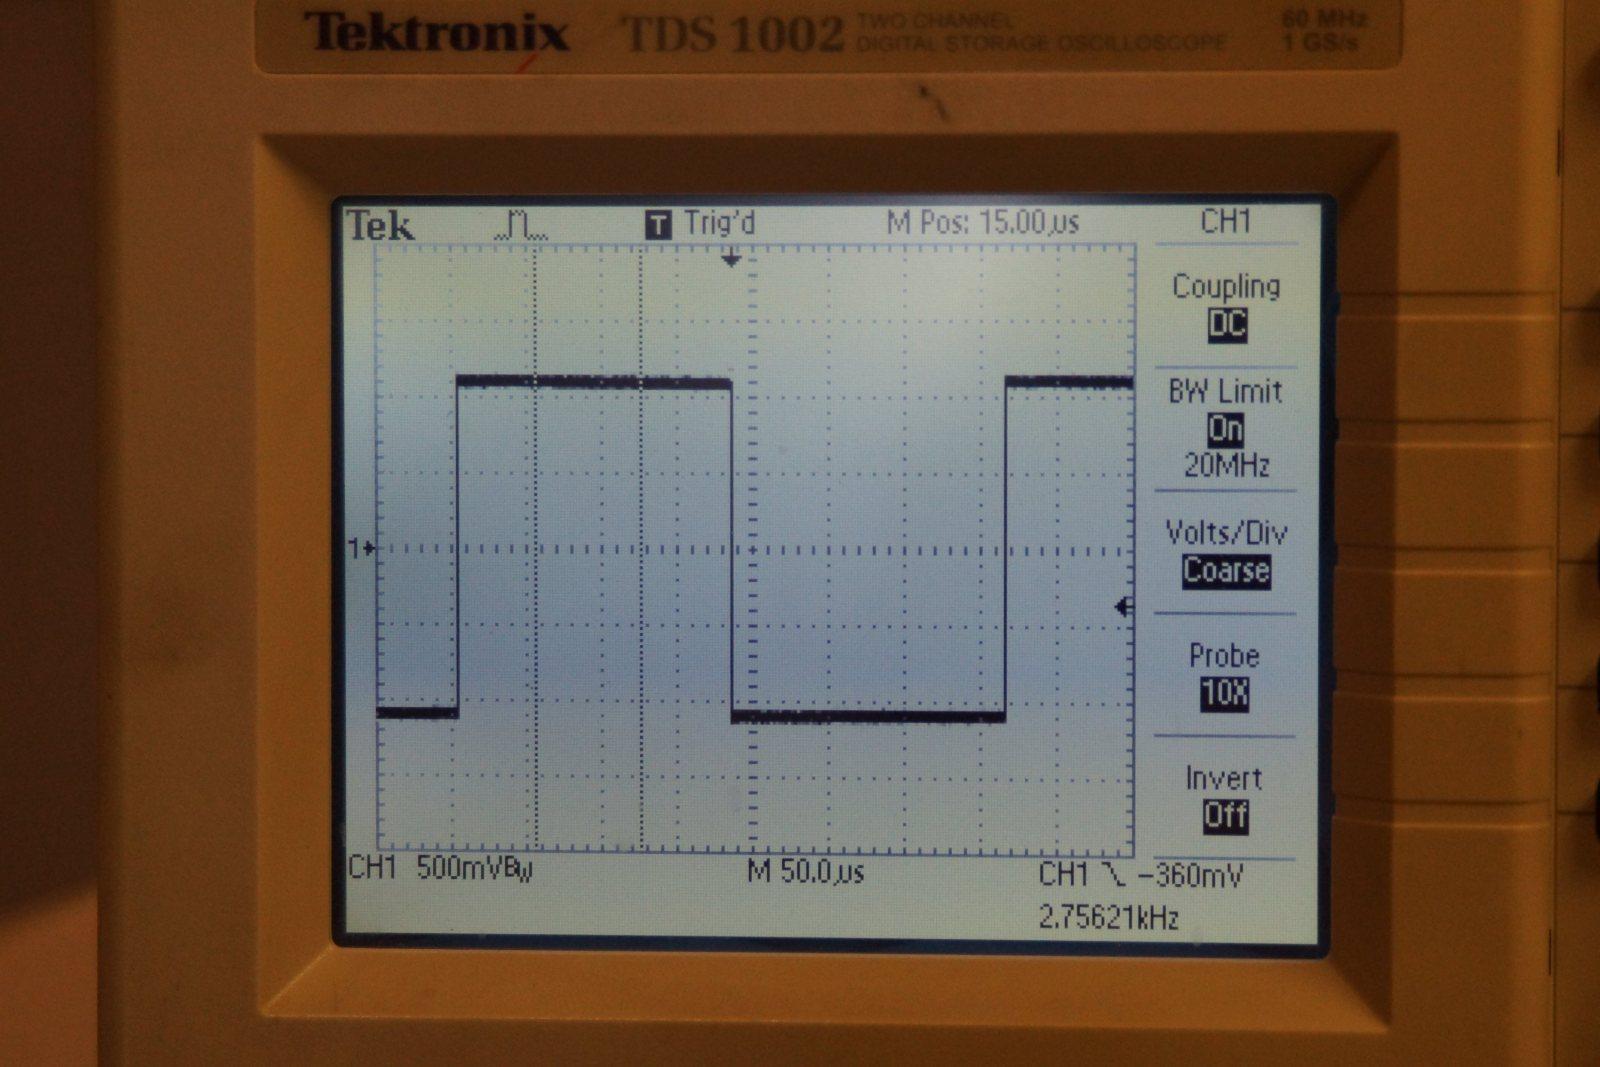 DSC03812_Filter_OFF.thumb.jpg.acd8edd7e973dd86cc38369d60e9bb82.jpg